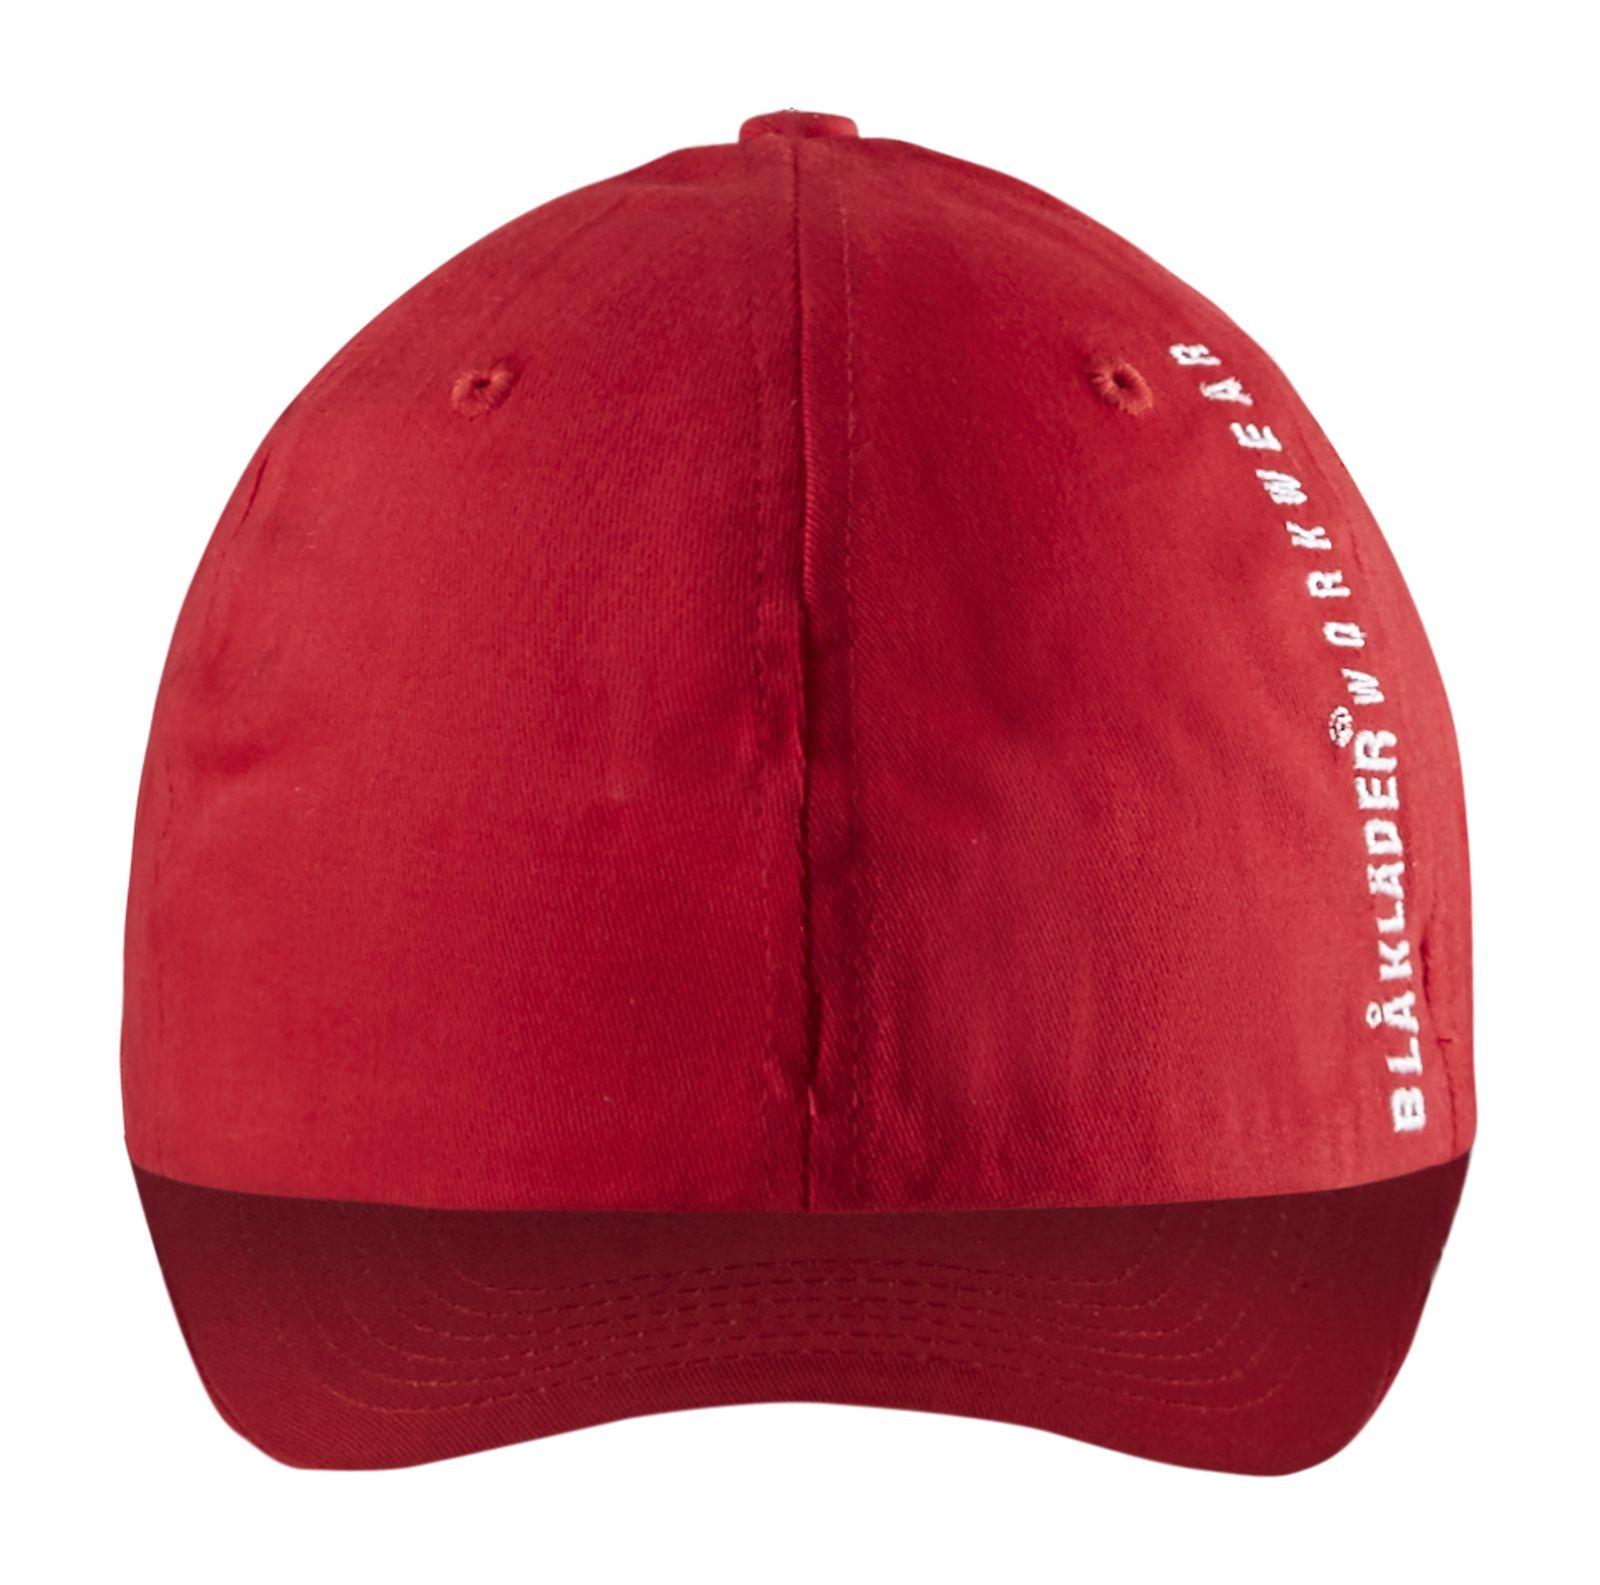 Blaklader Caps 90640000 rood(5600)